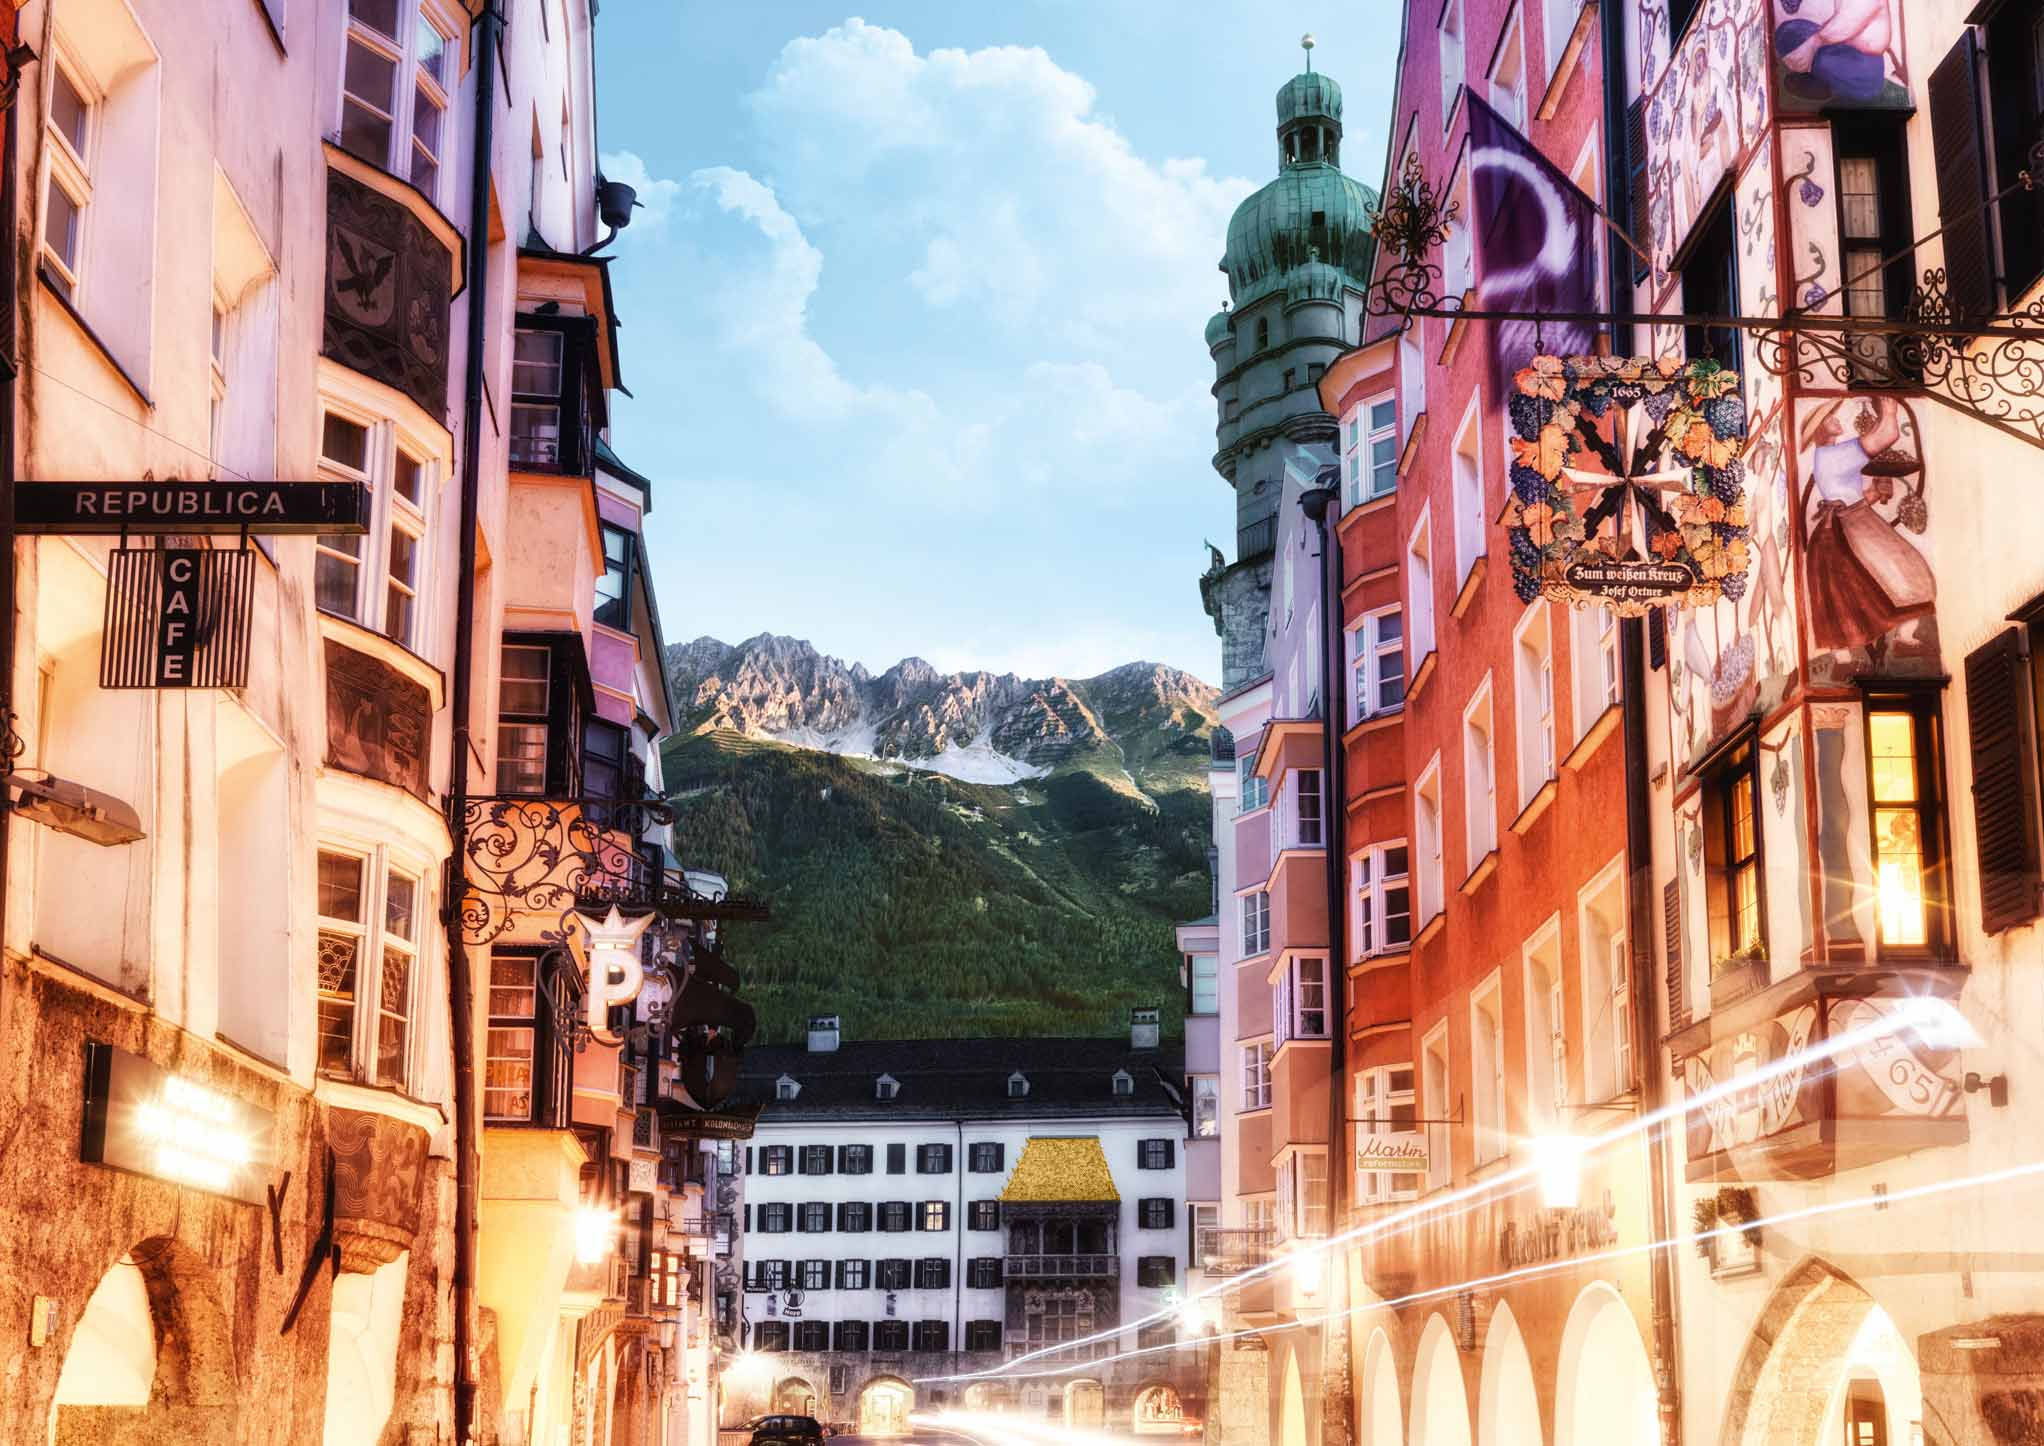 Tiroler Adventzauber mit Kitzbühel - innsbruck - Swarovski Kristallwelten